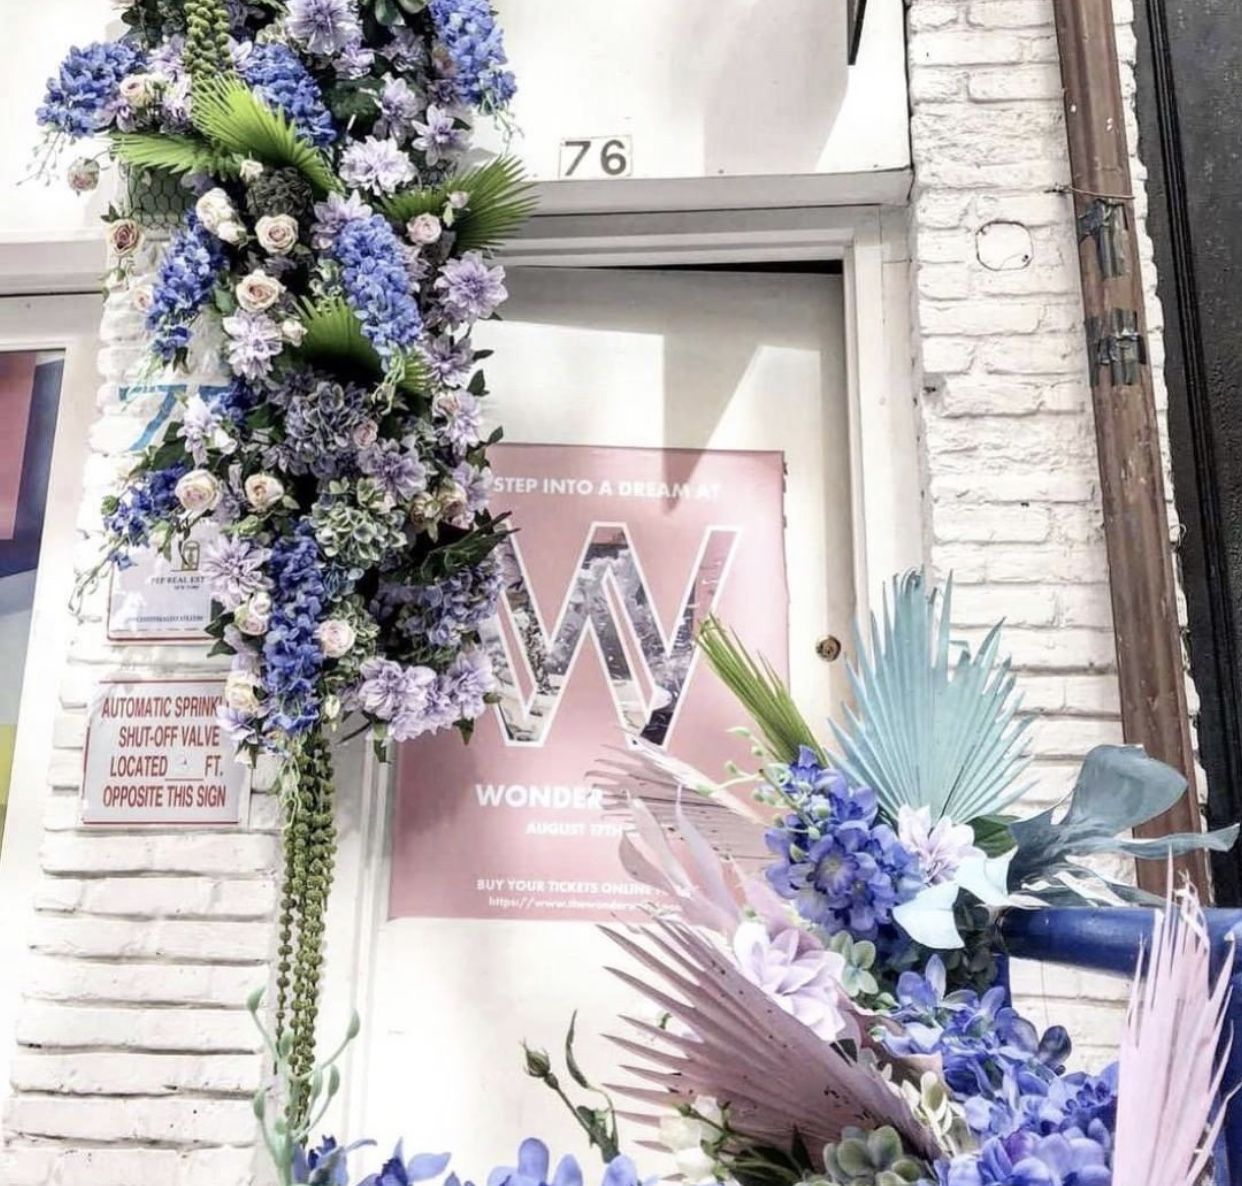 The entrance to Wonder World! Photo via  @WonderWorldSpace